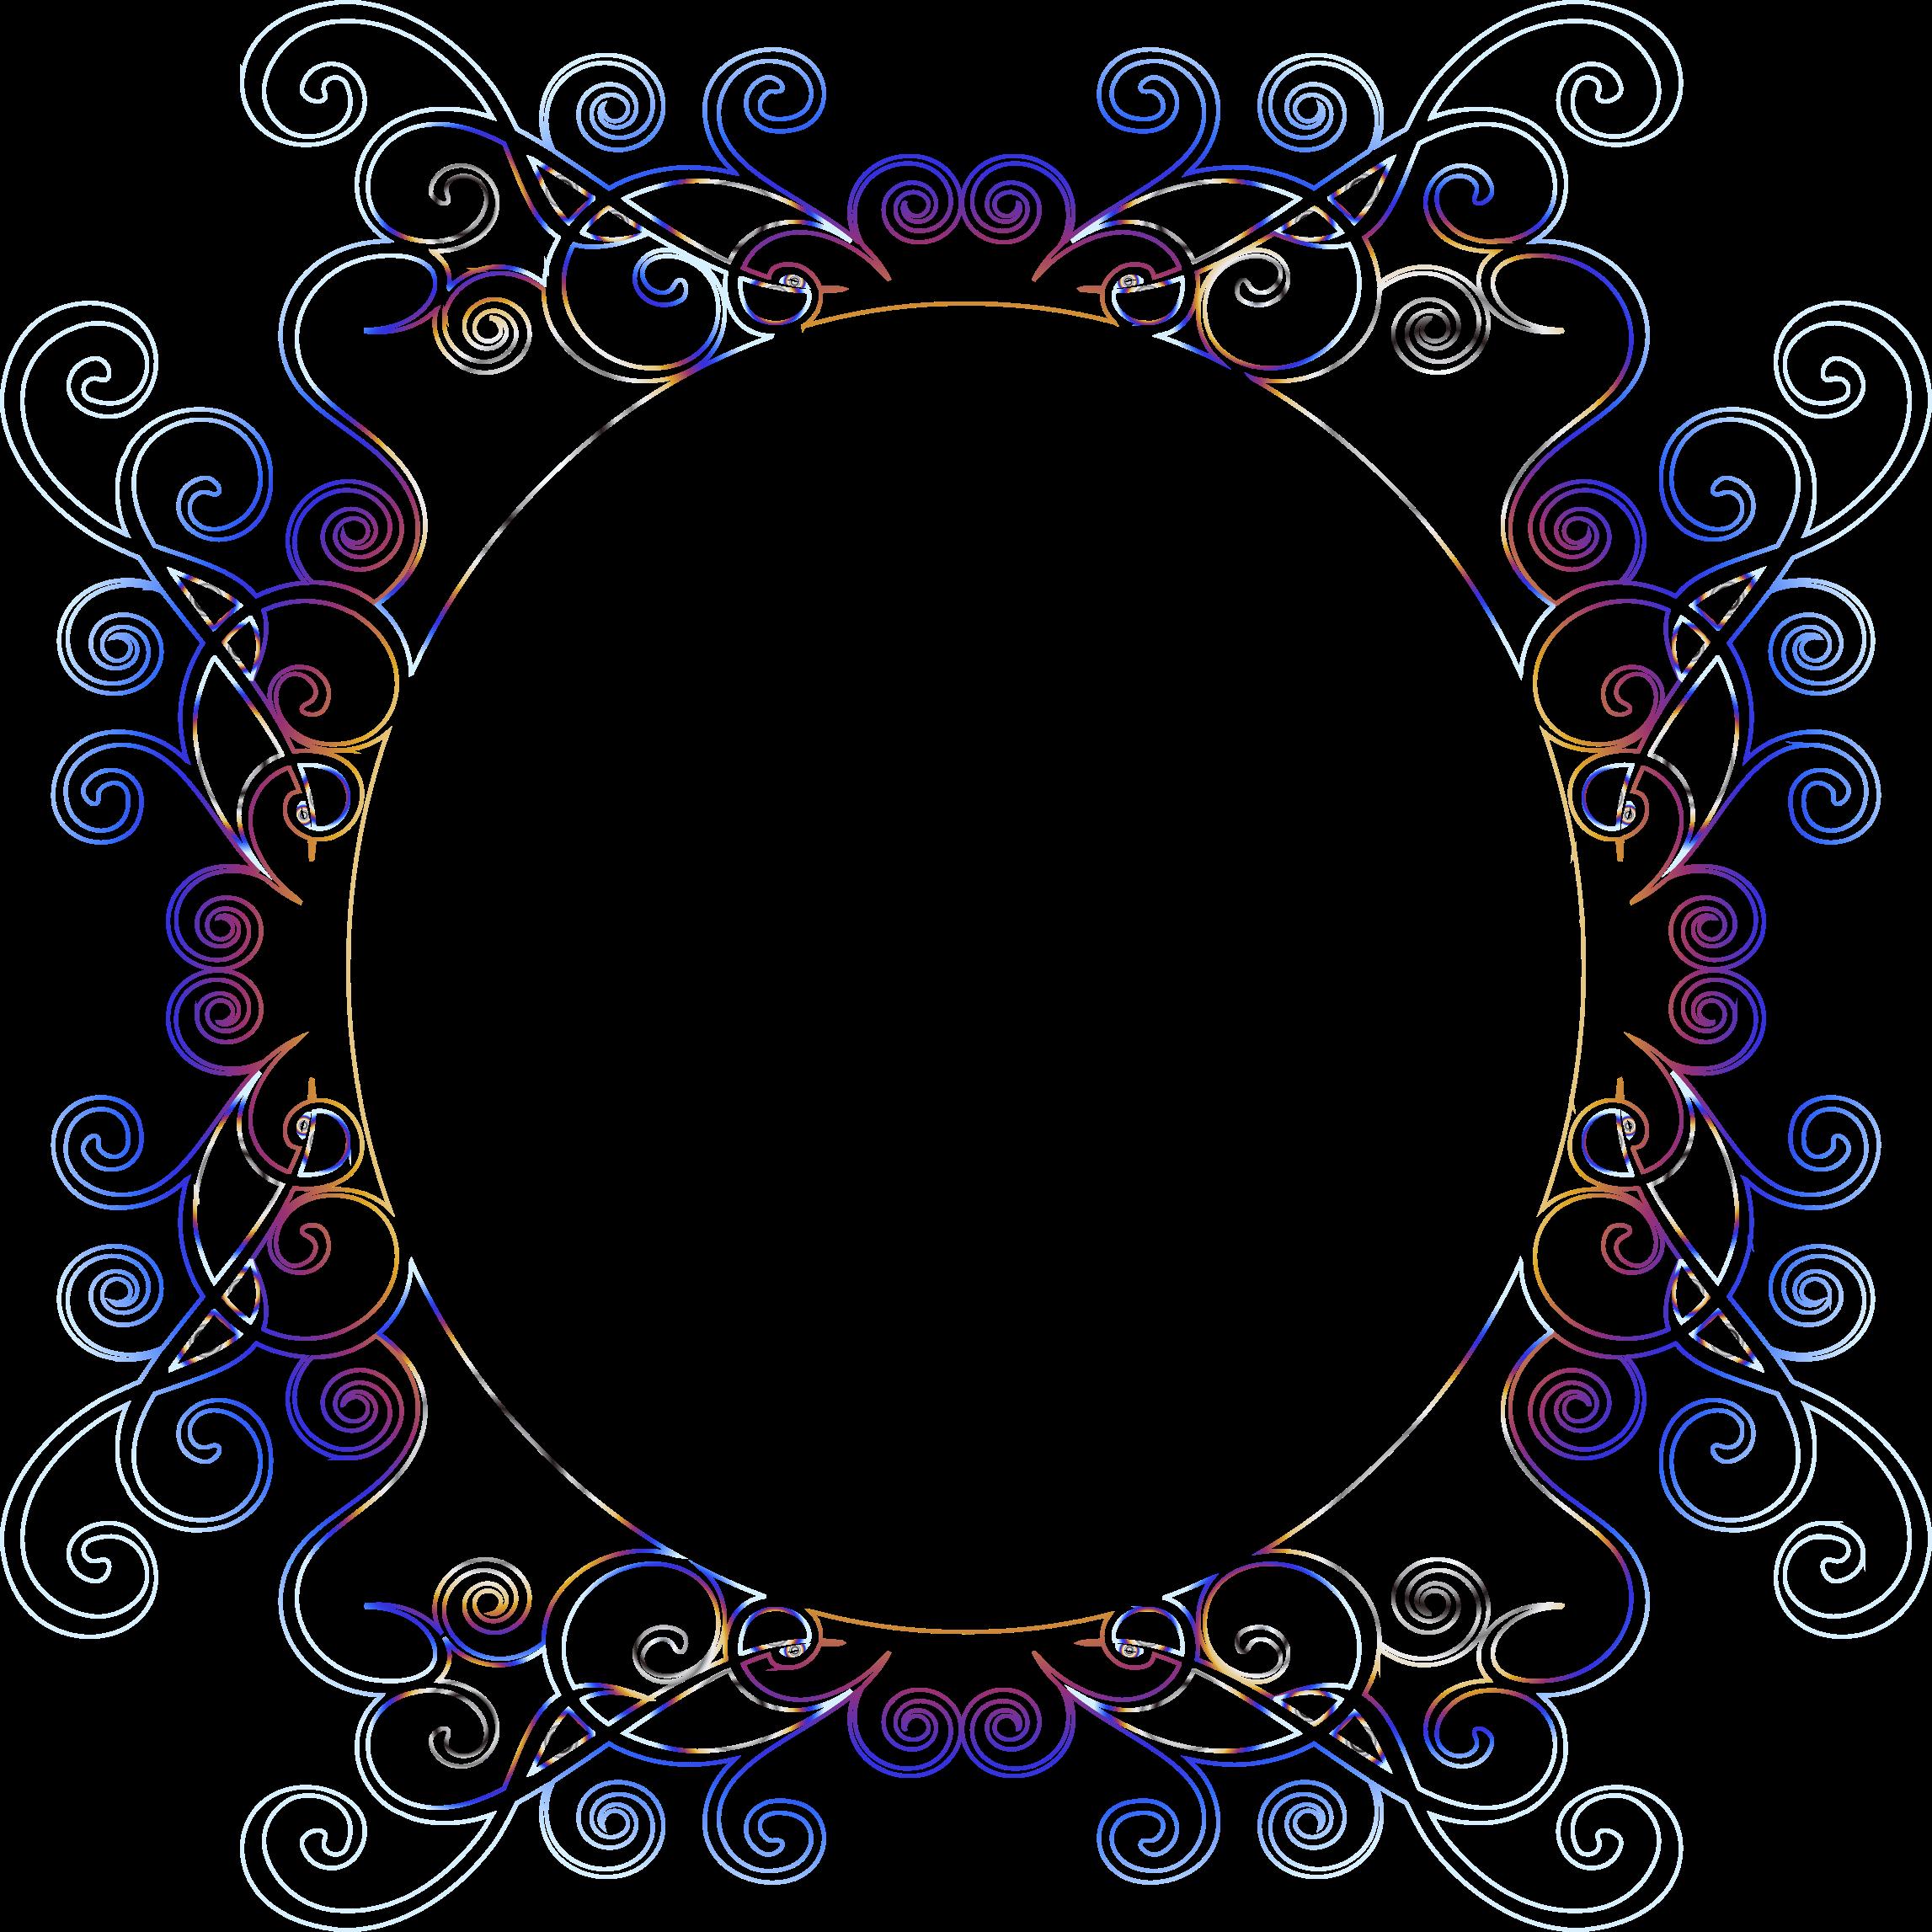 Flourishes clipart border. Prismatic flourish frame no